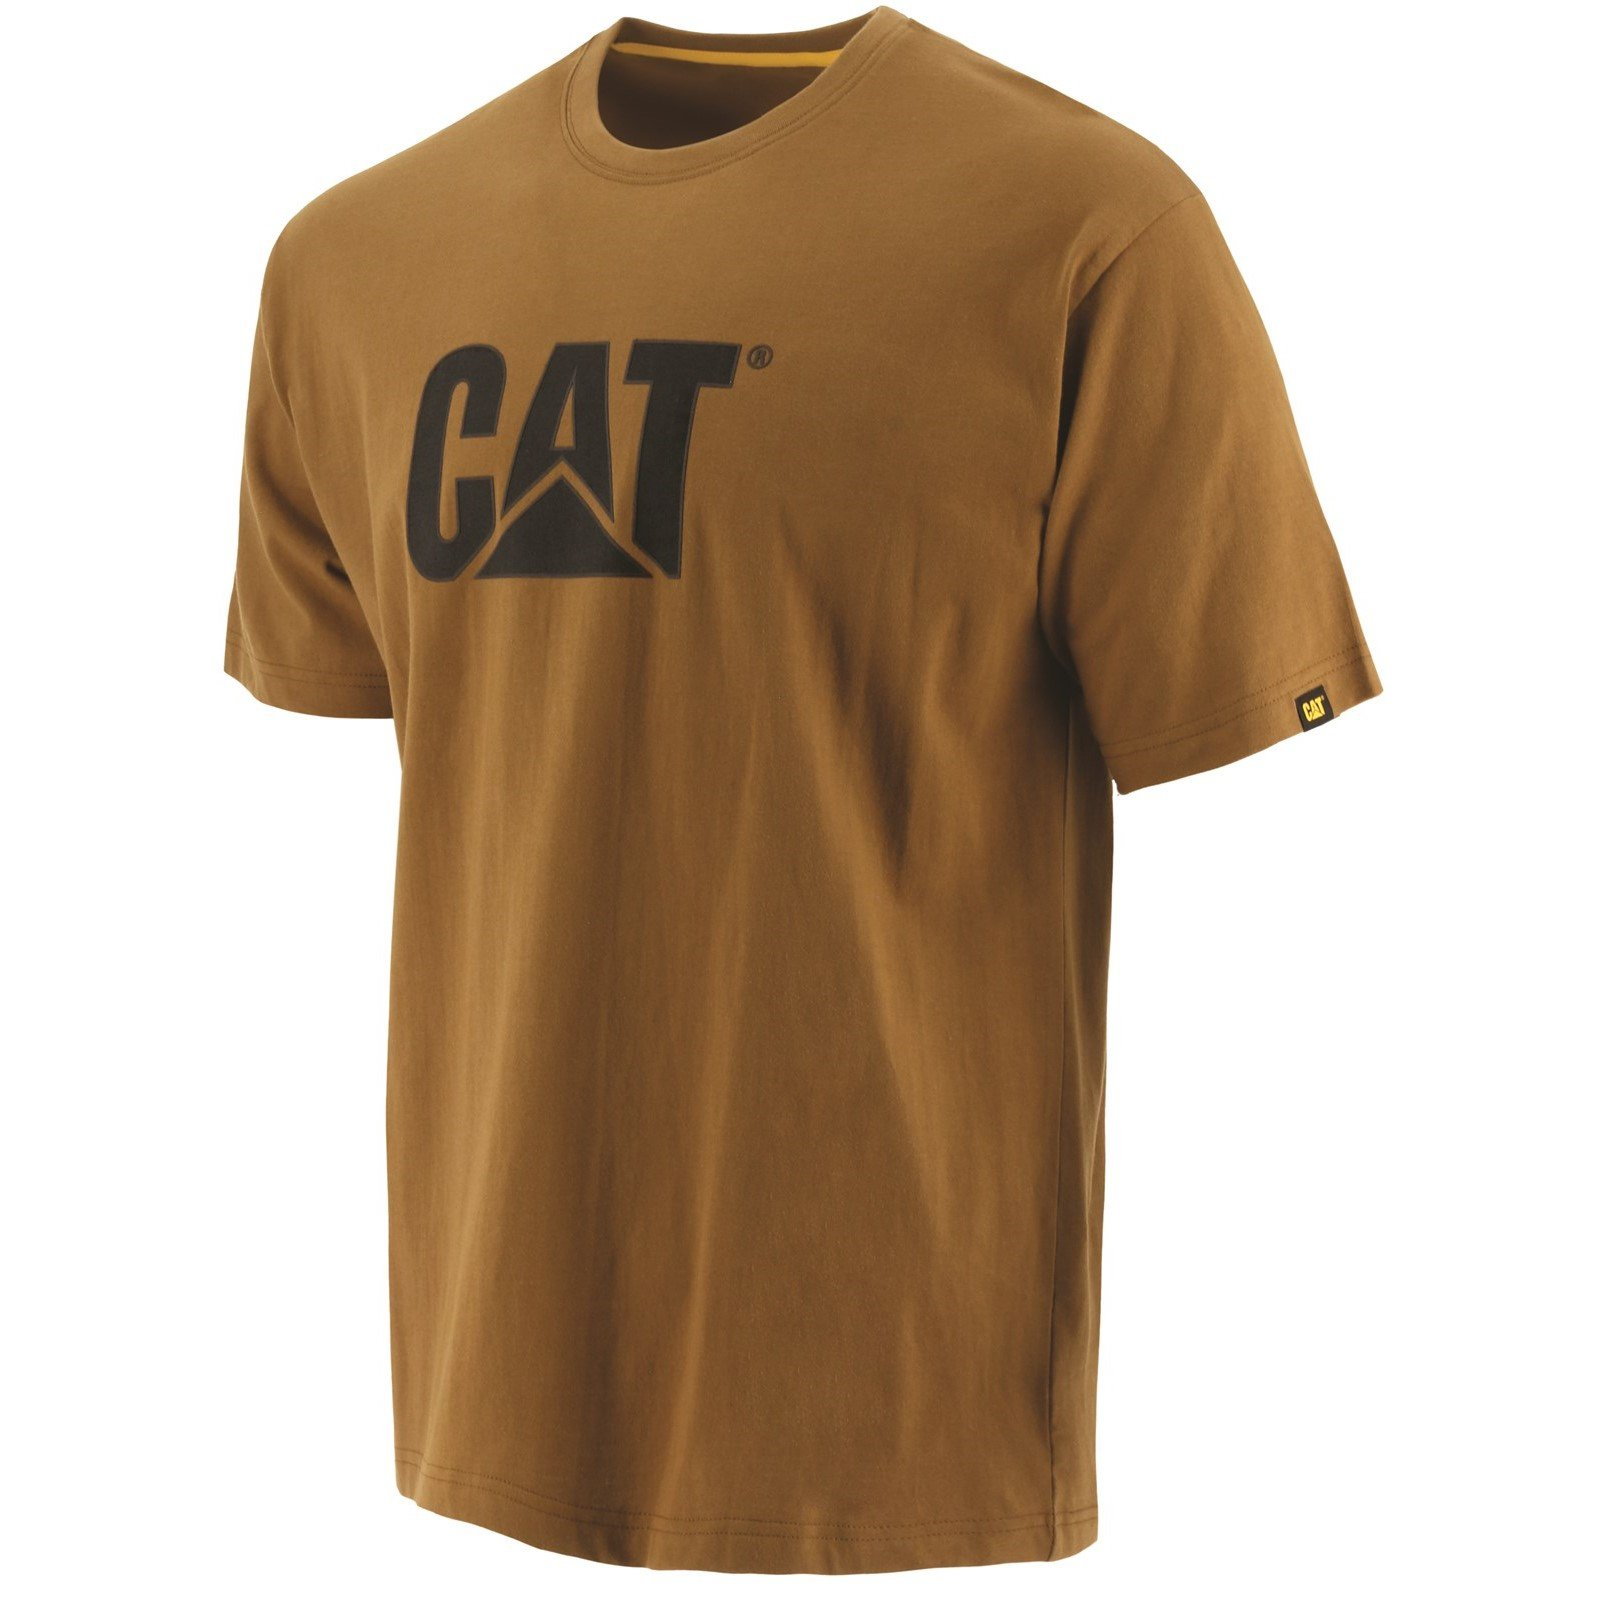 Caterpillar Men's Trademark Logo T-Shirt Various Colours 25301-42086 - Bronze Lge